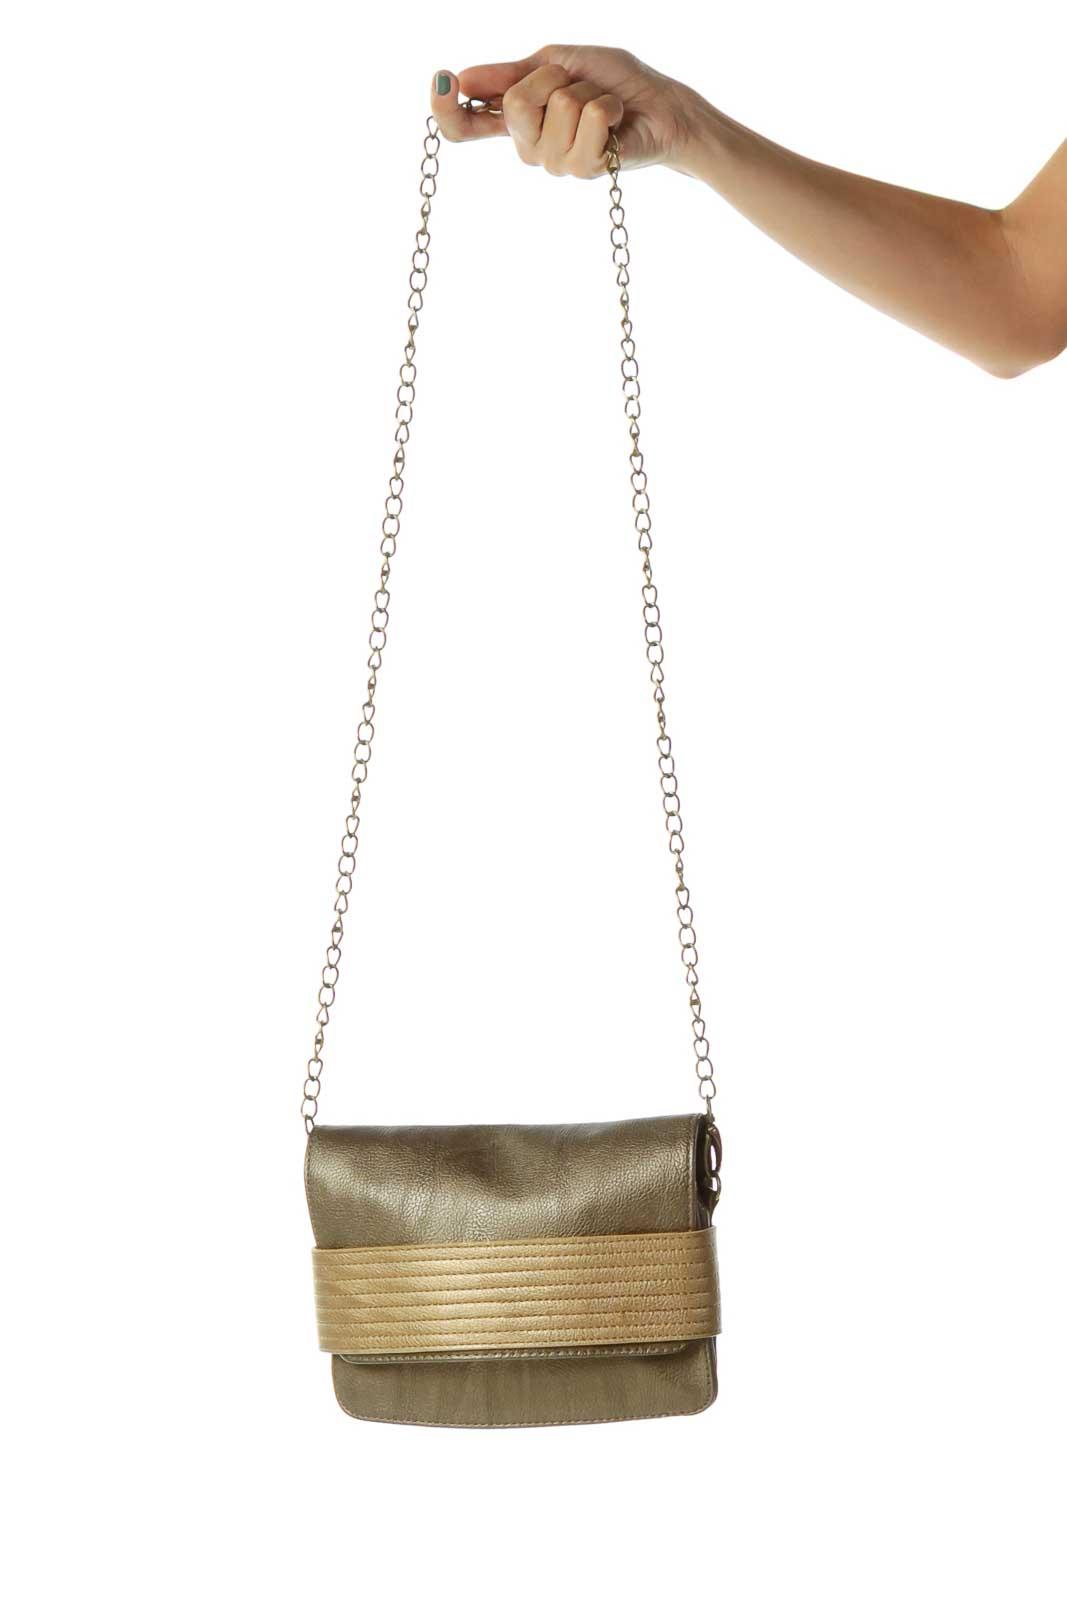 Gold Two-Tone Metallic Crossbody Bag Front